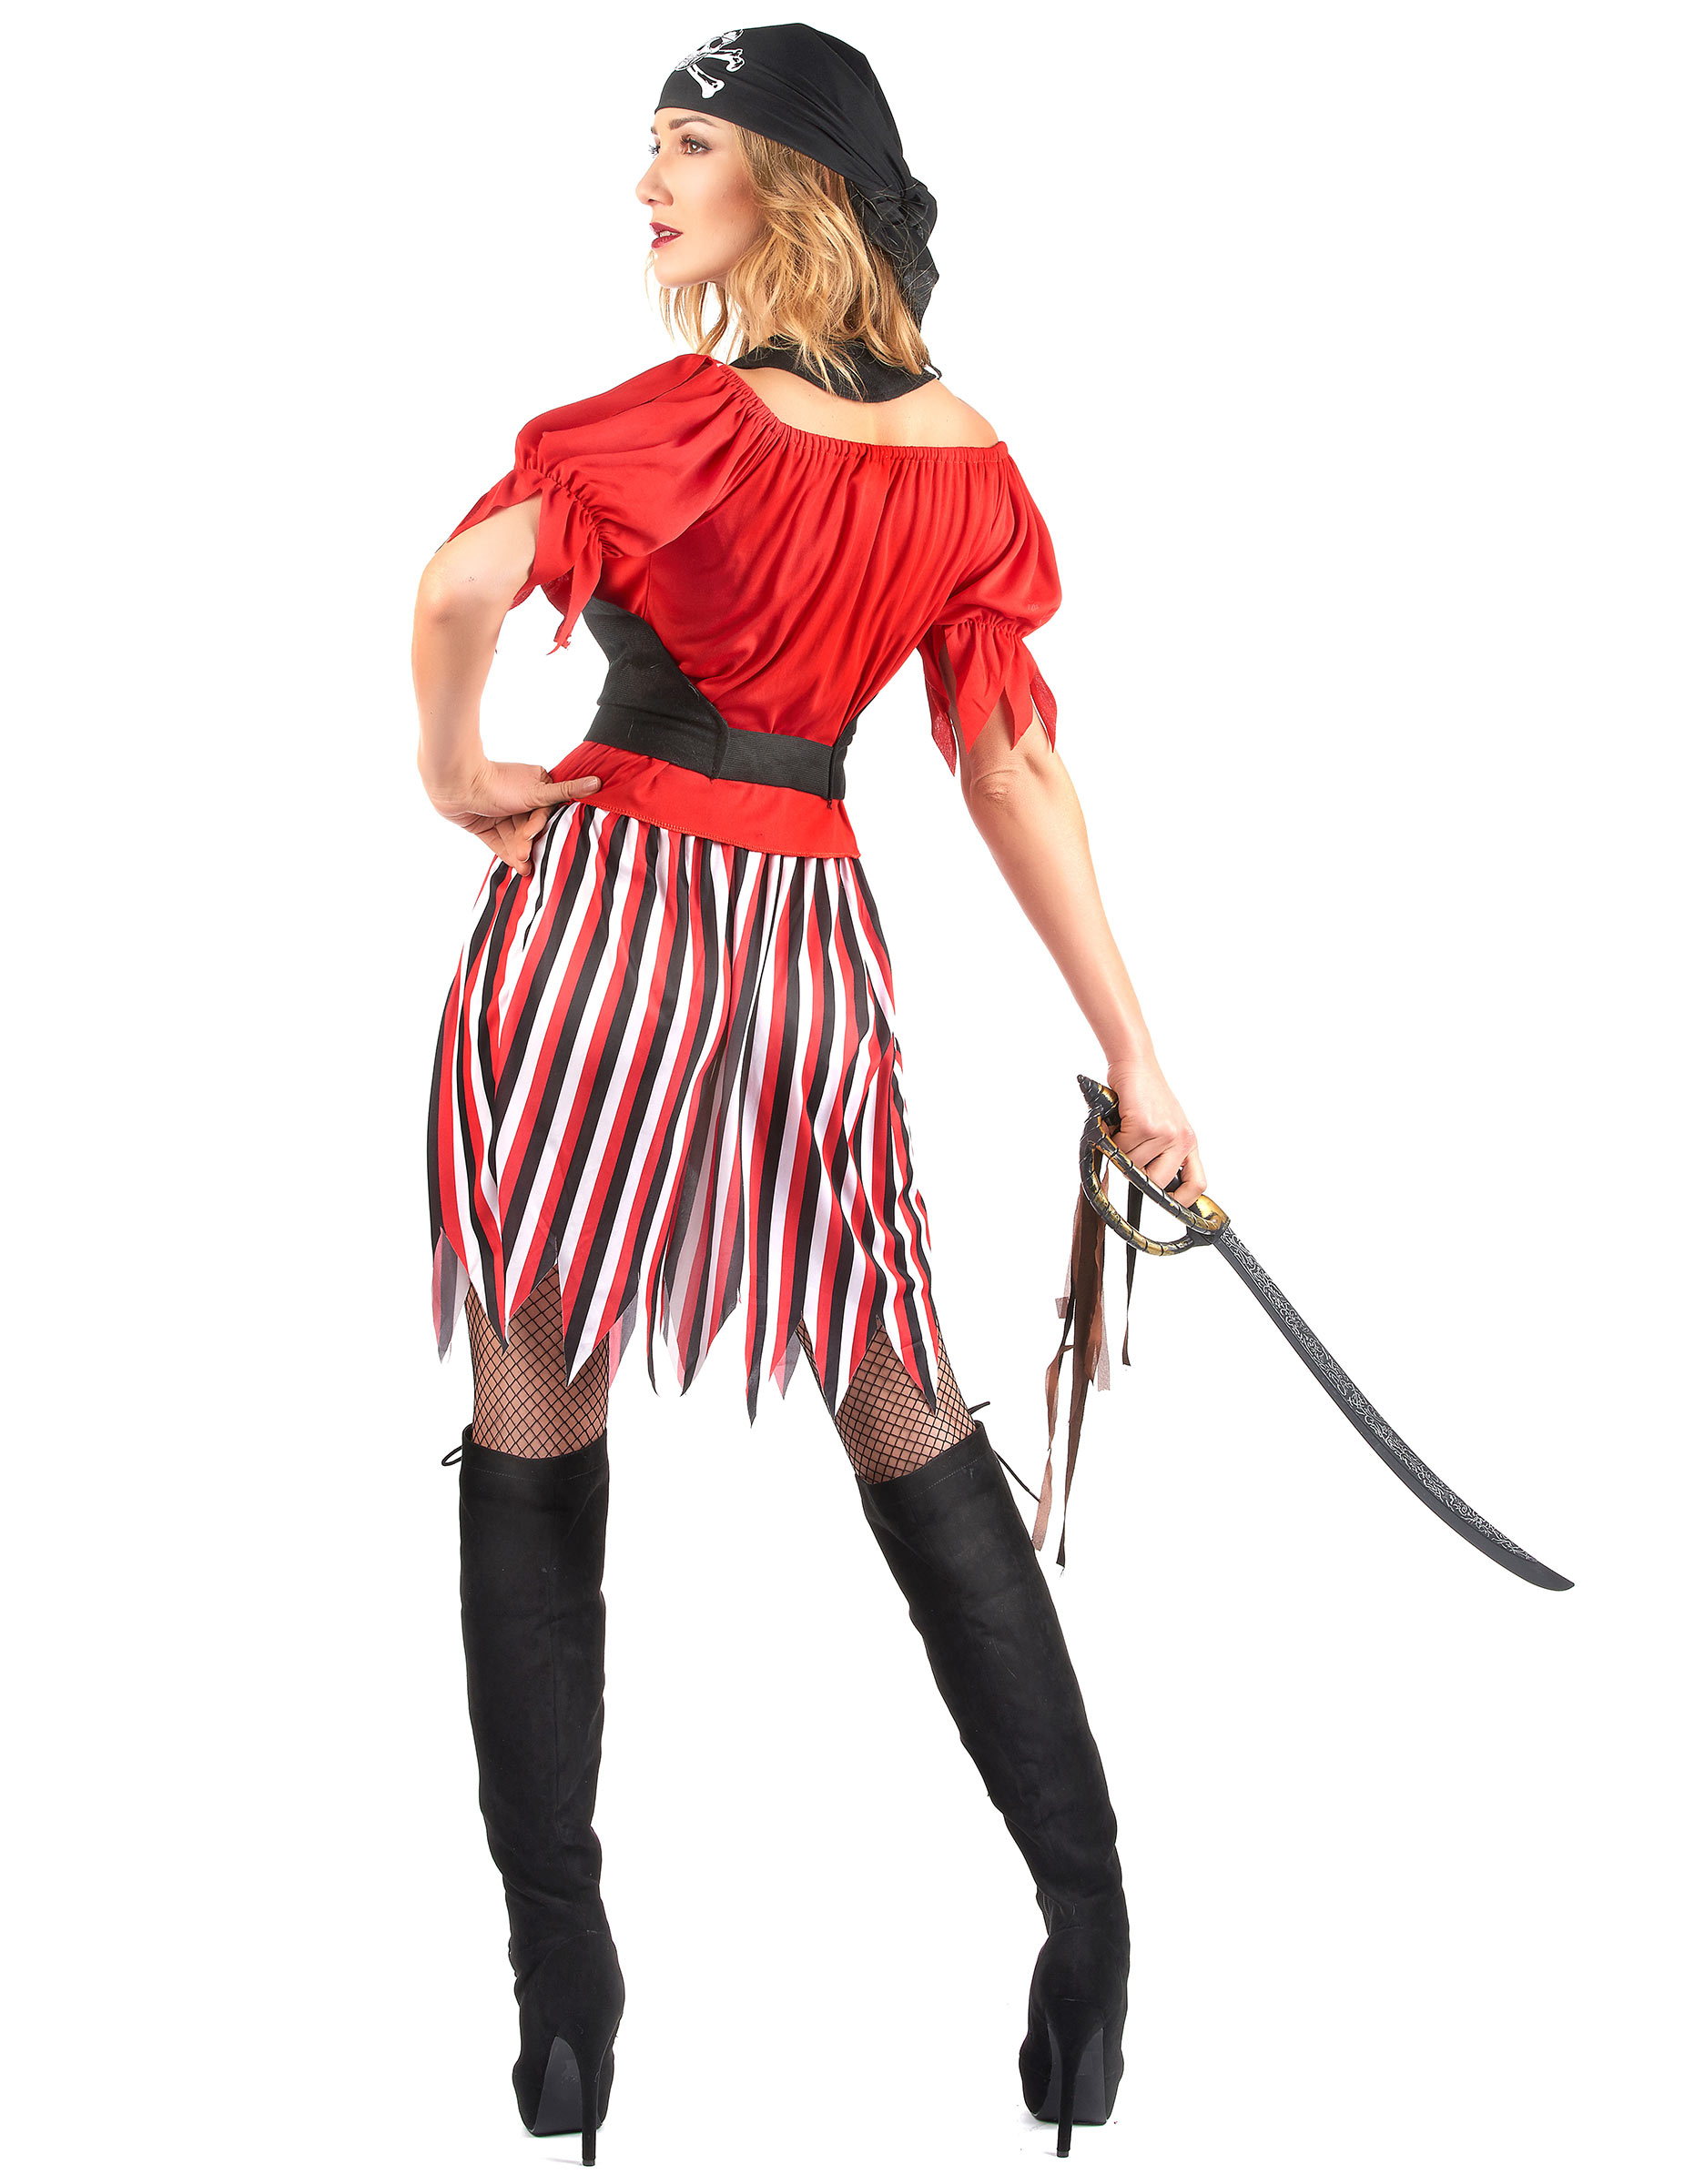 Piratenbraut Kostum Fur Damen Schwarz Weiss Rot